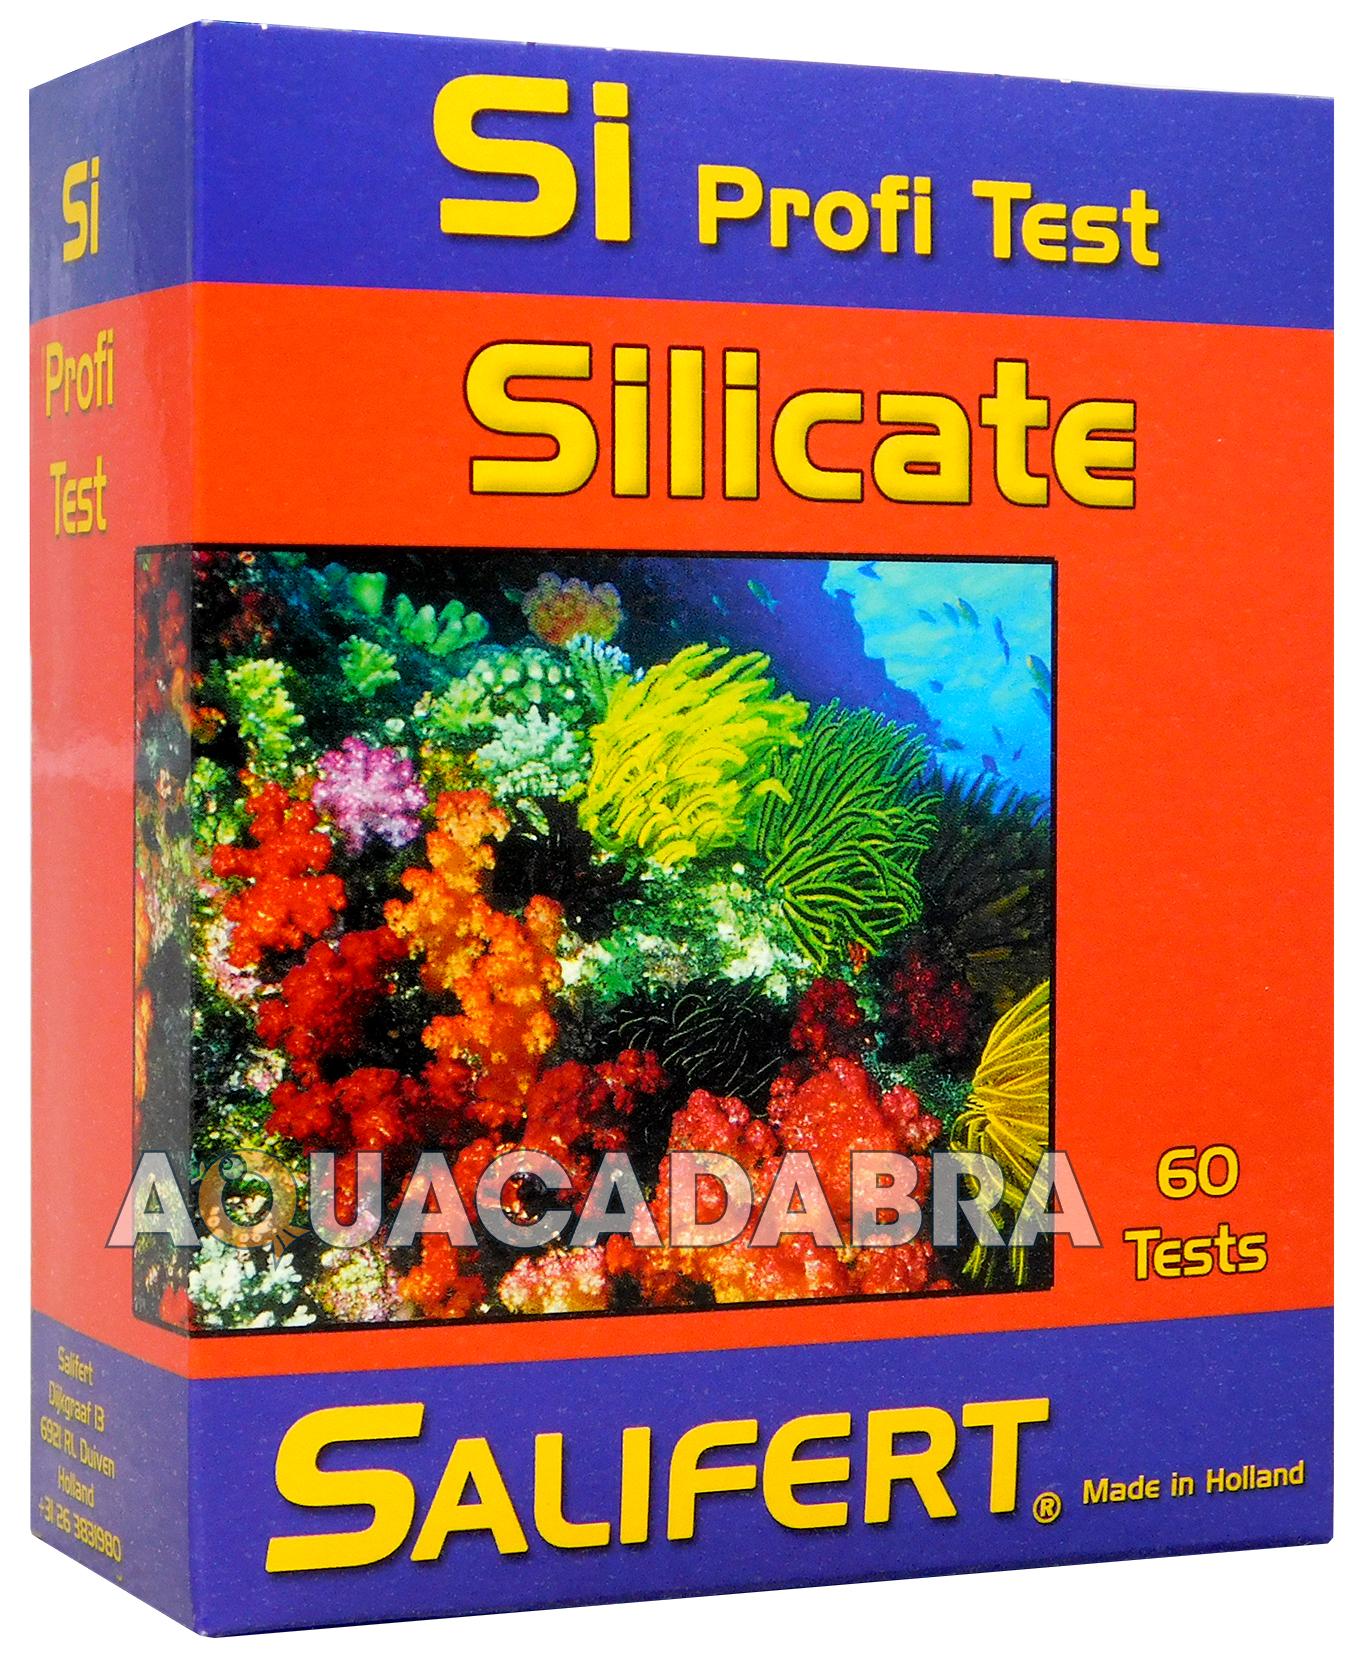 led growth decor colro decoration orphek best aquarium coral lighting spectrum light for